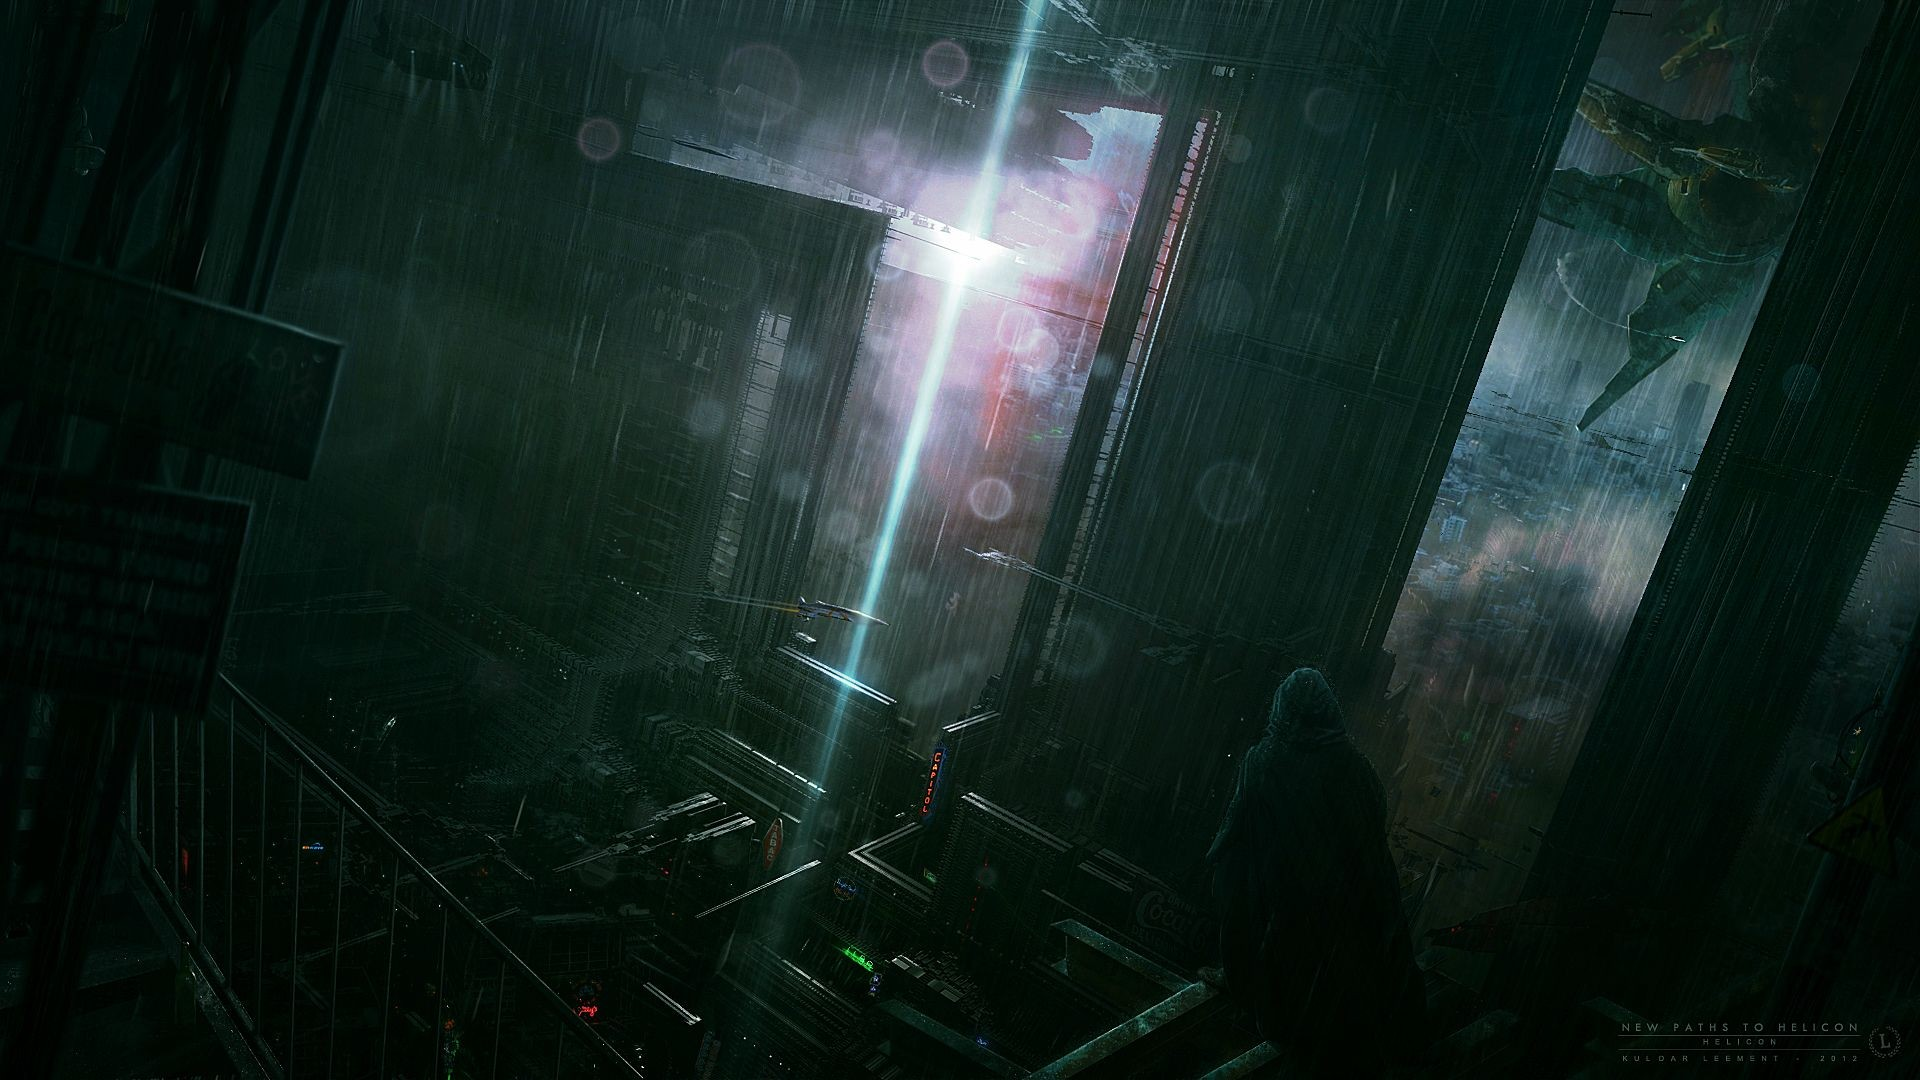 Futuristic Mech Cg Digital Dark Scifi Storm Cities ArtHD 1920x1080